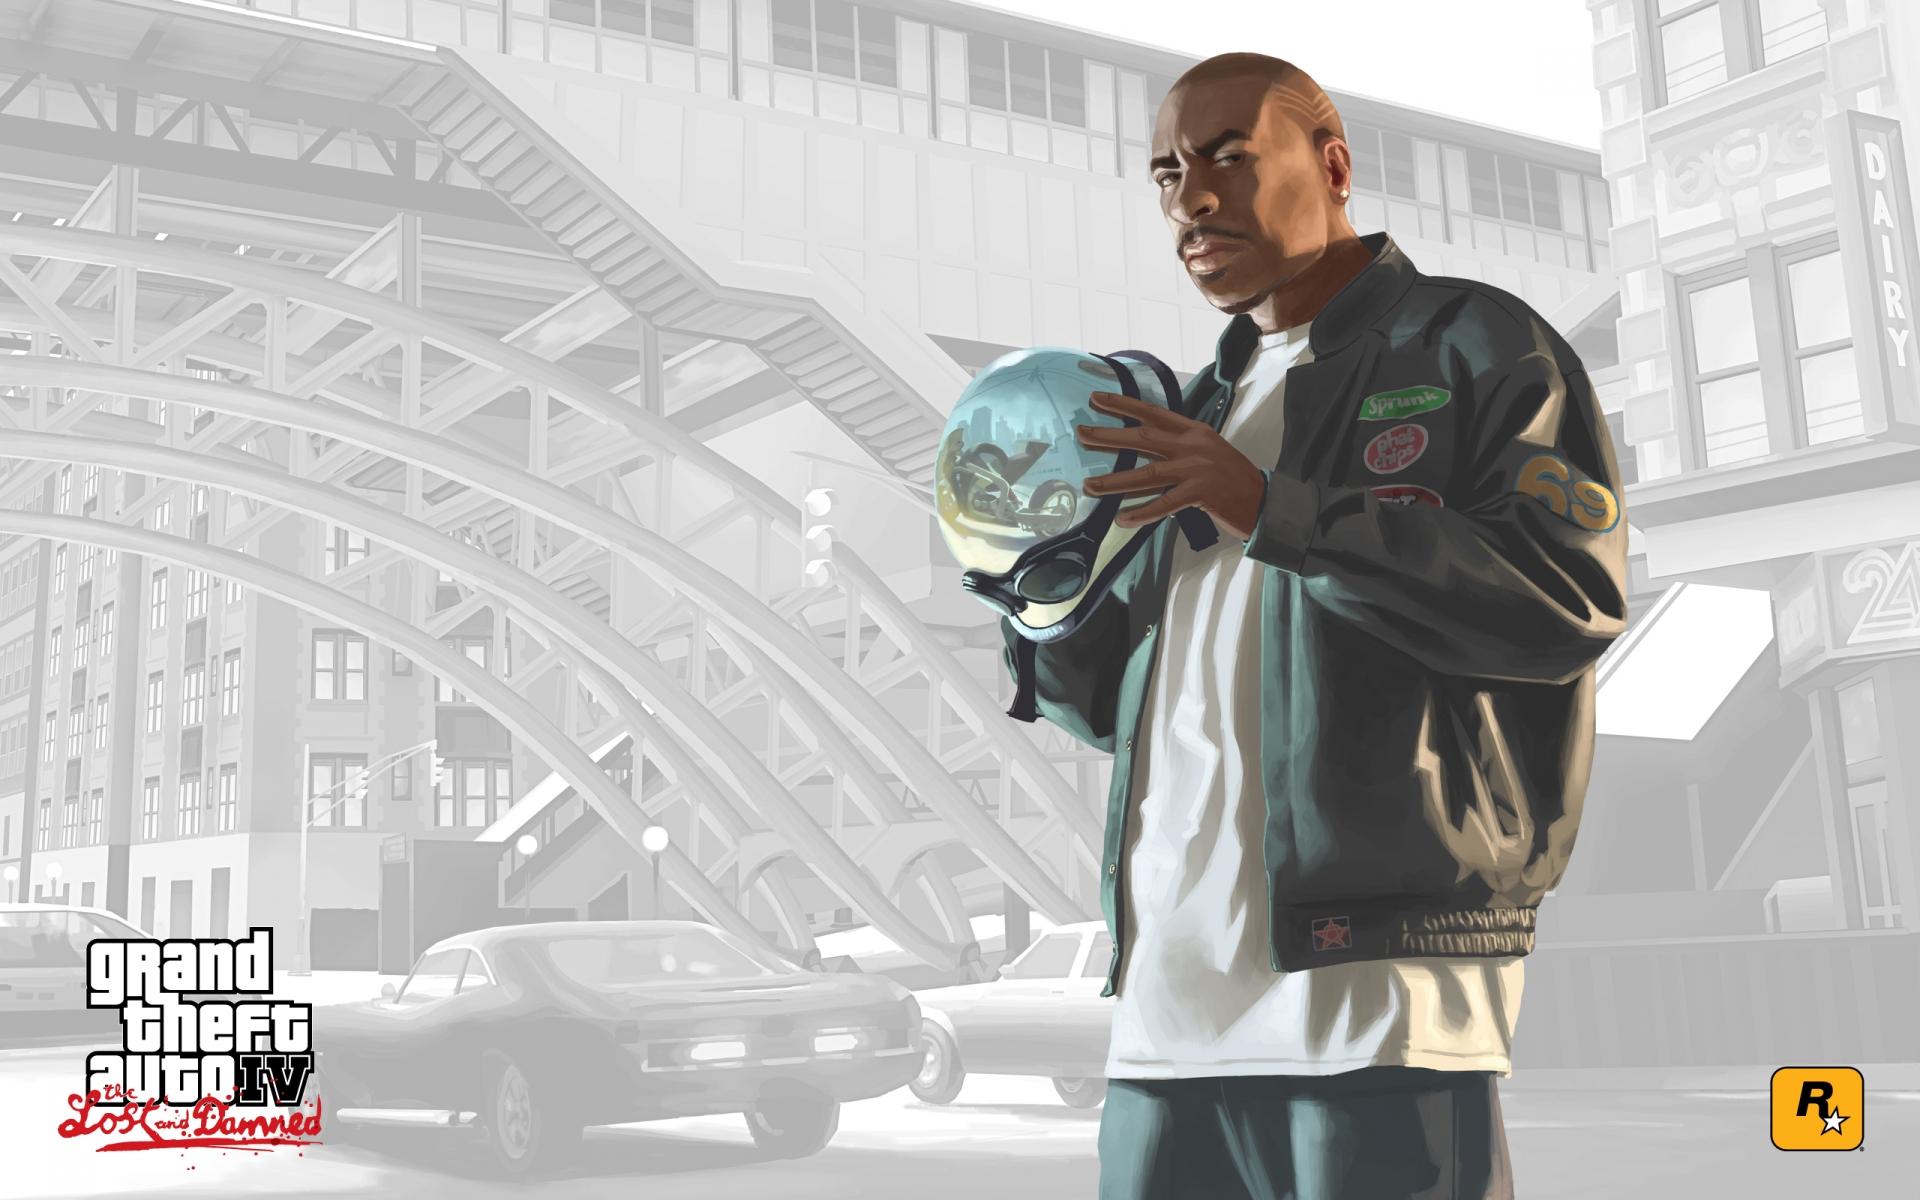 Арт к игре Grand Theft Auto: Episodes From Liberty City